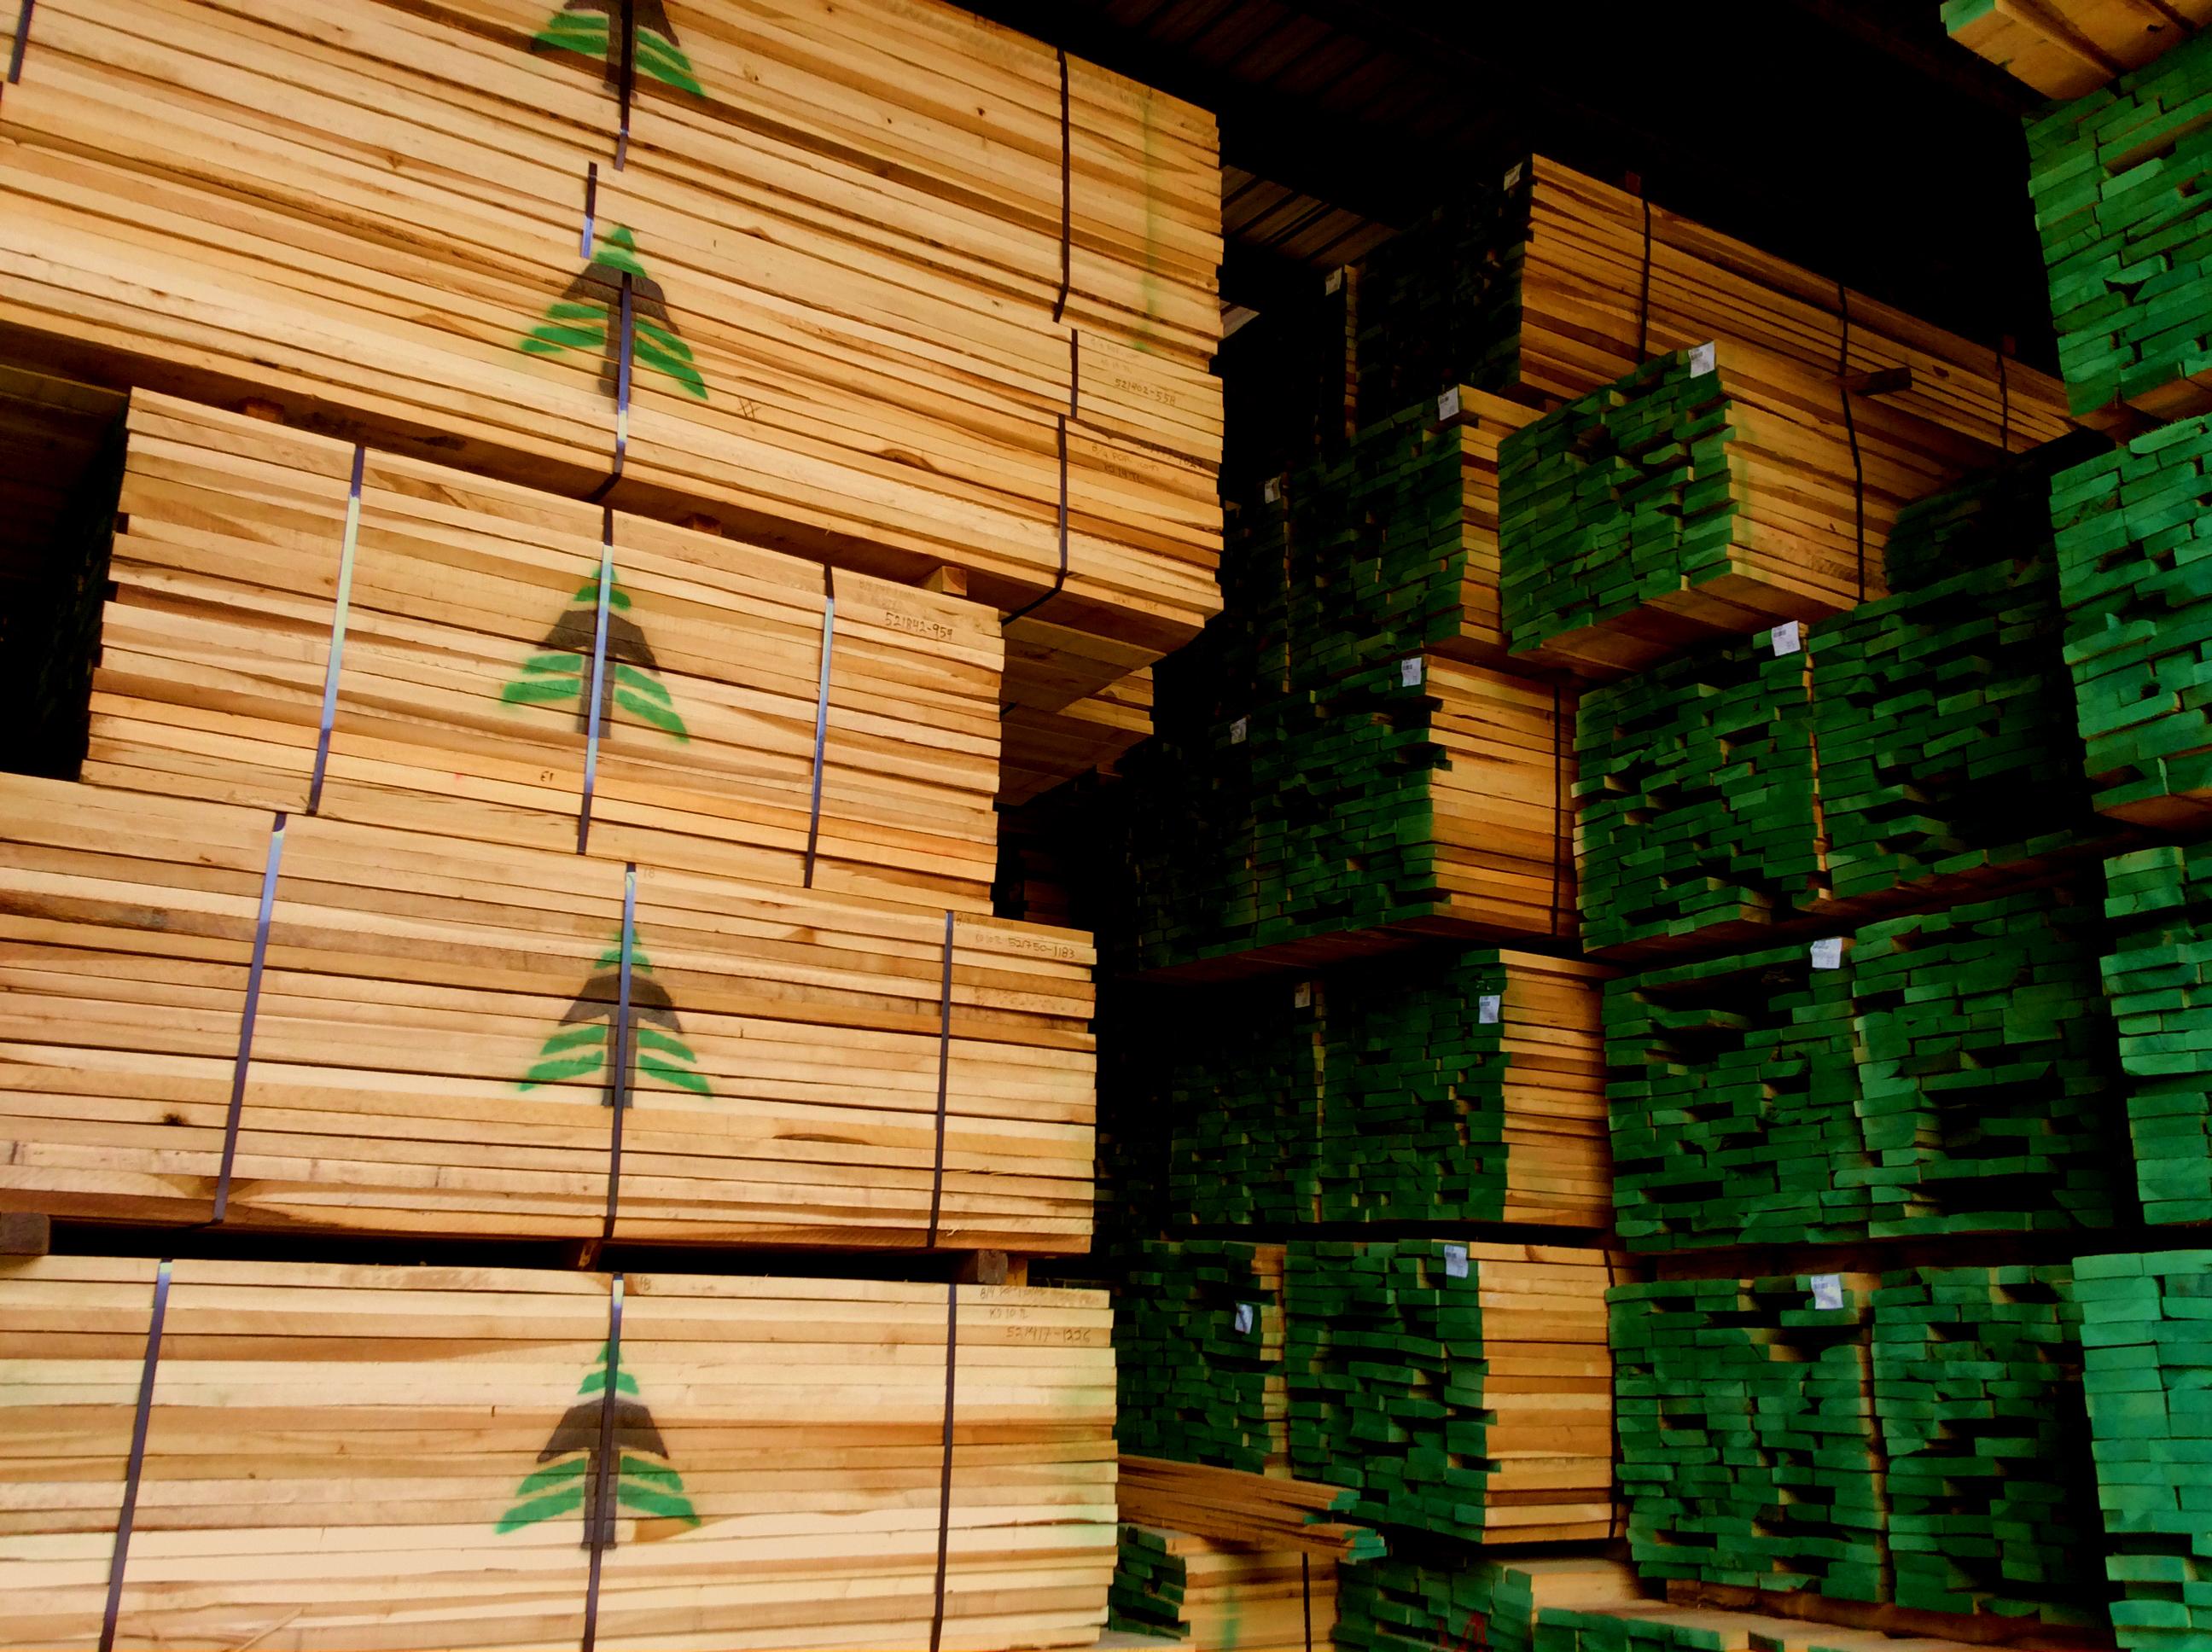 turman lumber packs with green